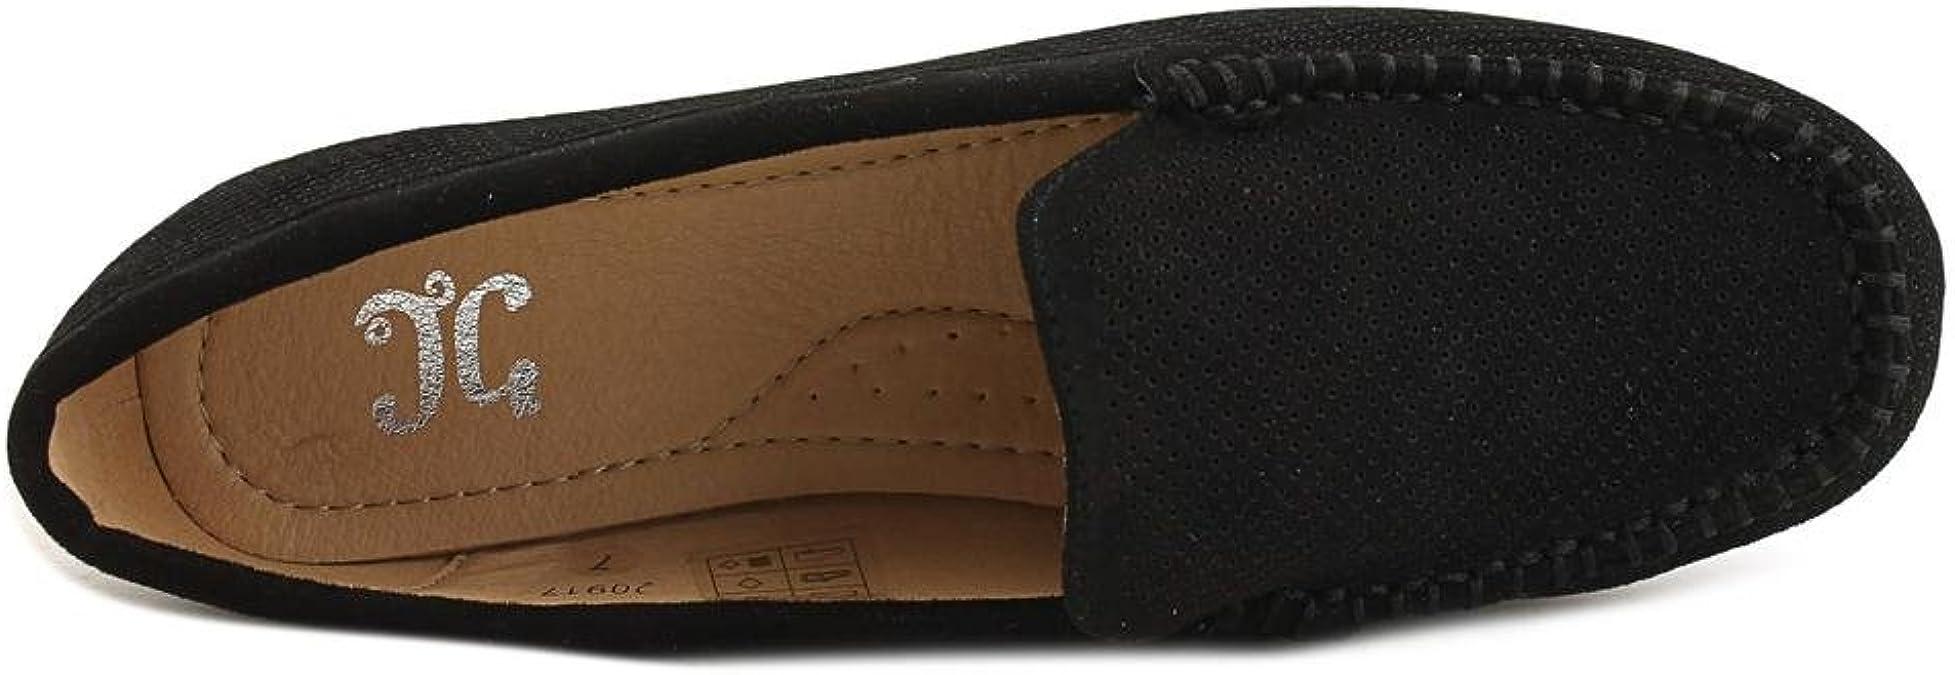 Brinley Co Womens Comfort Sole Faux Nubuck Laser Cut Loafers